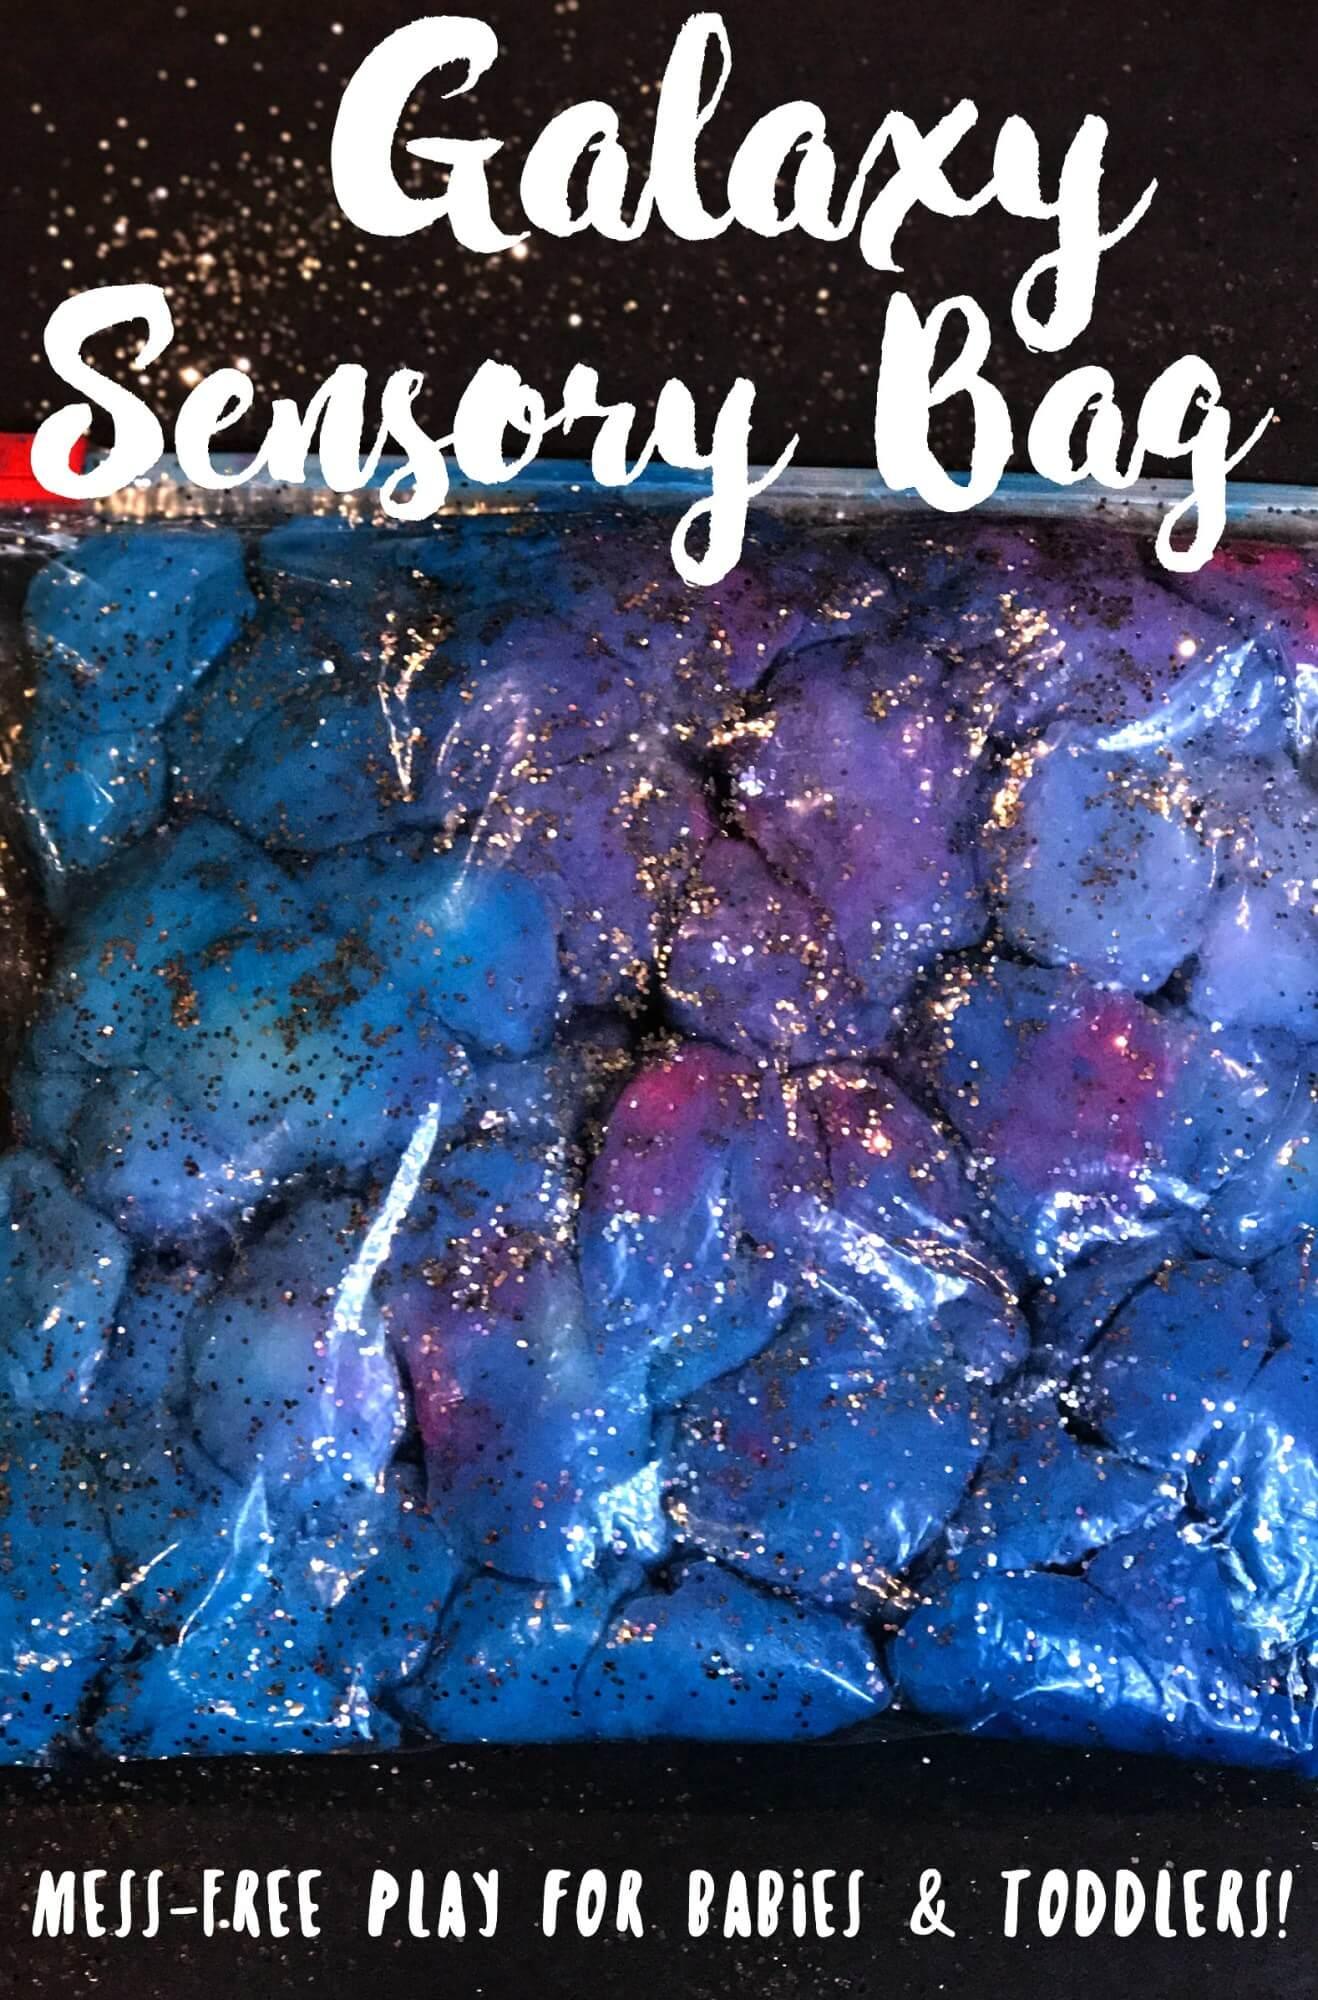 Space Sensory Bag